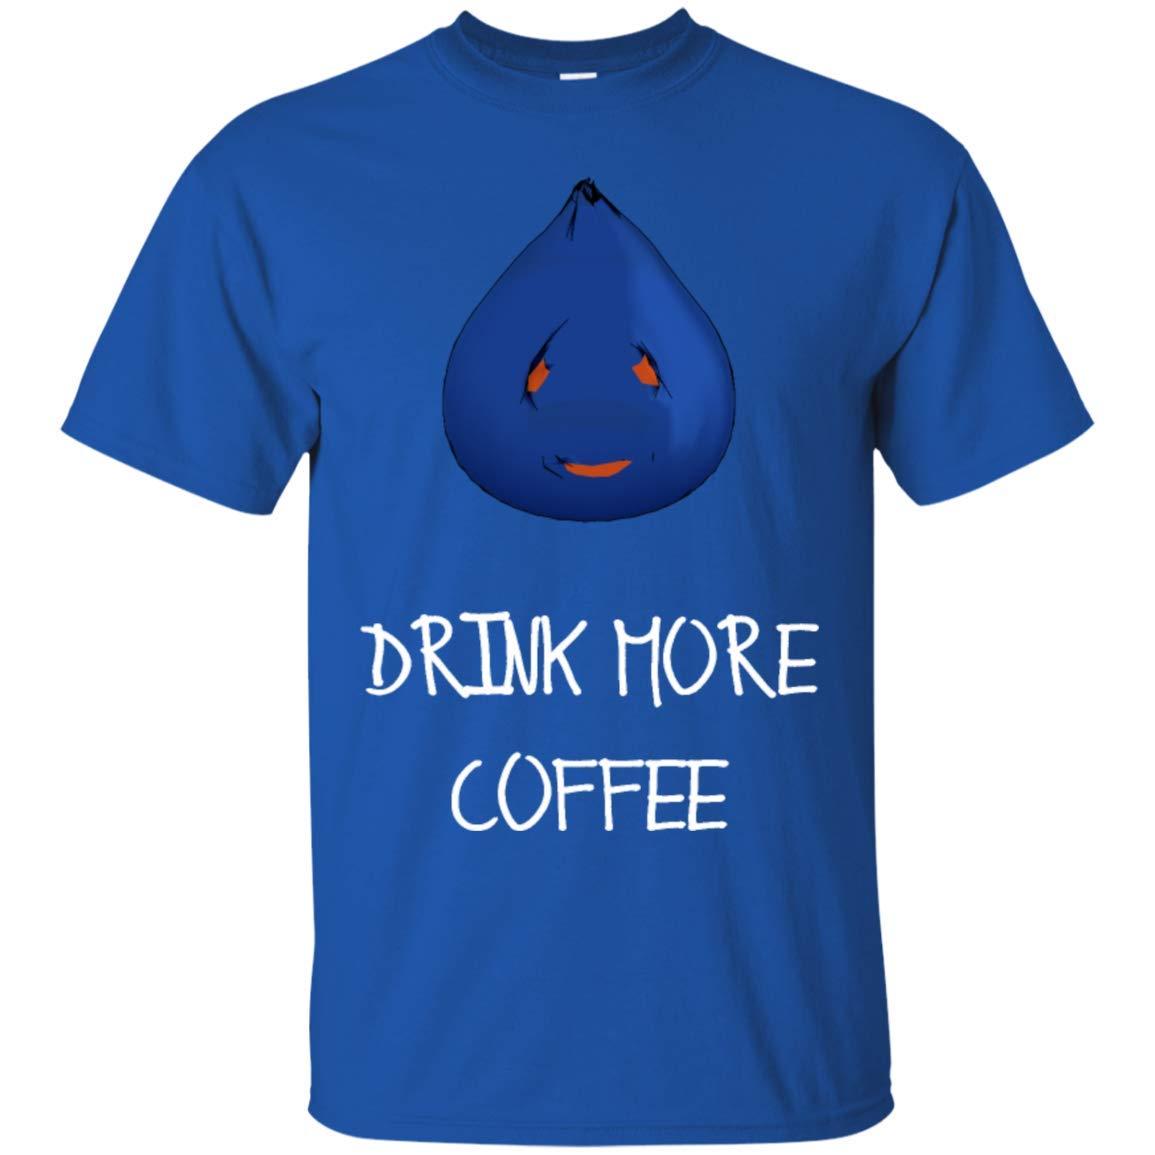 Drink More Coffee Funny Coffee Shirt